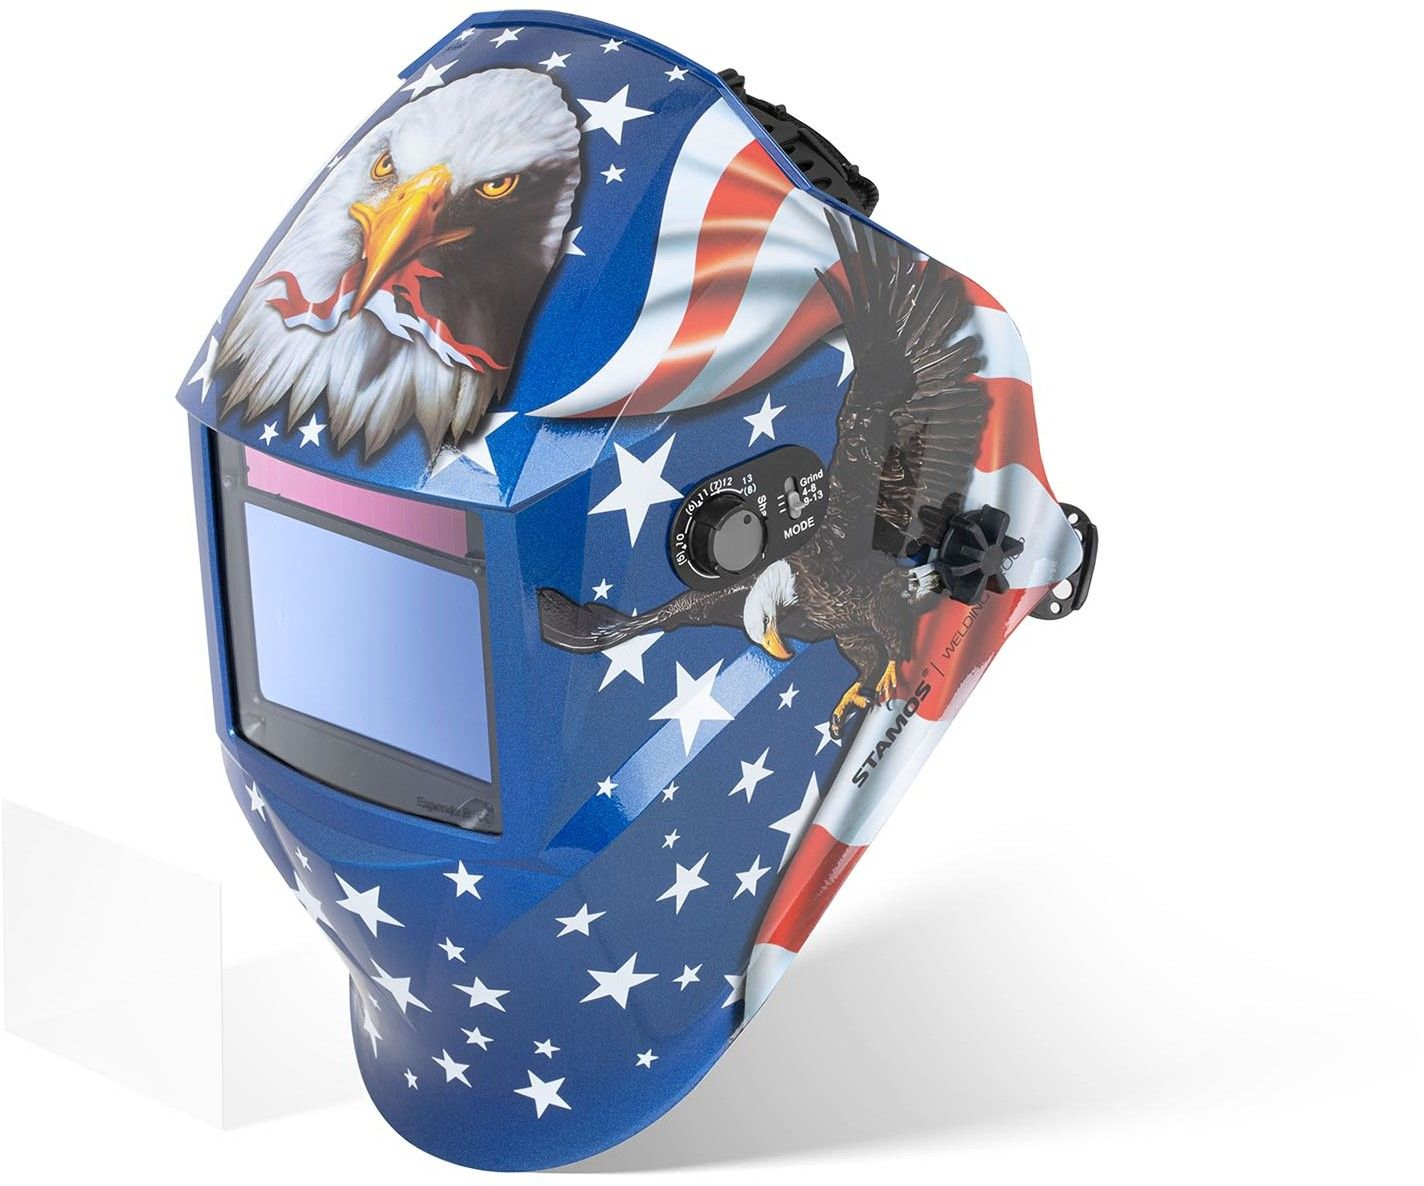 Maska spawalnicza - Liberty - Professional - Royal Catering - Liberty Advanced Series - 3 lata gwarancji/wysyłka w 24h